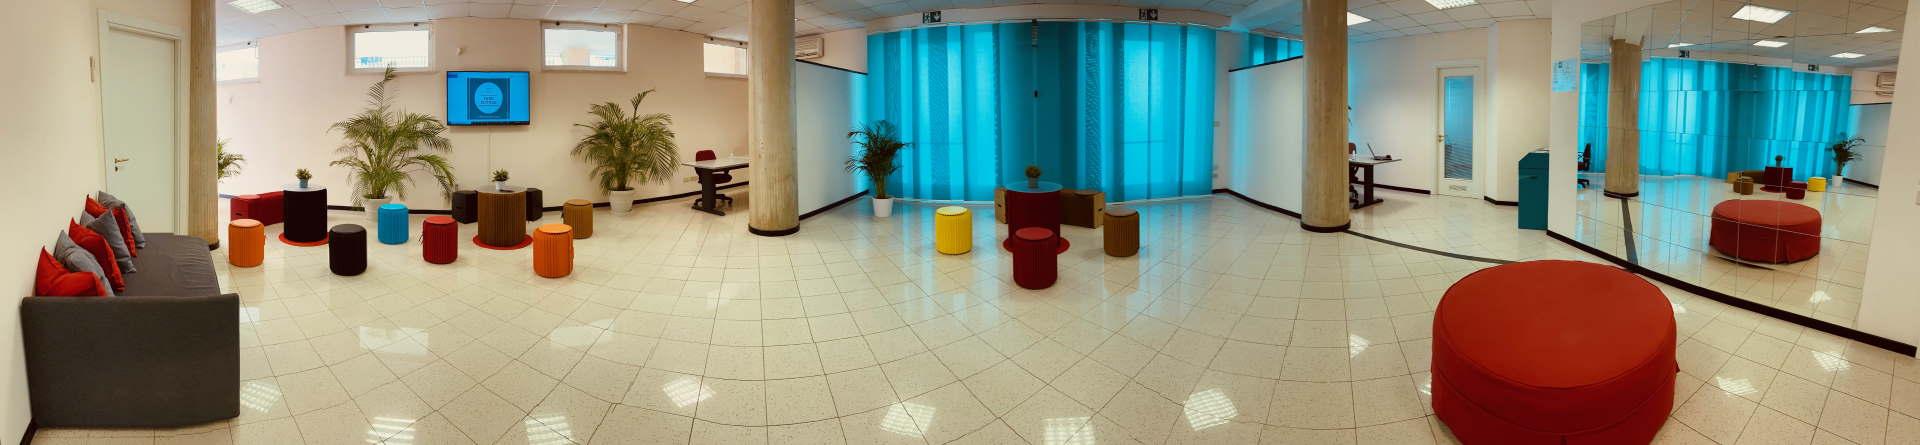 Sala_Multifunzione_Panoramica